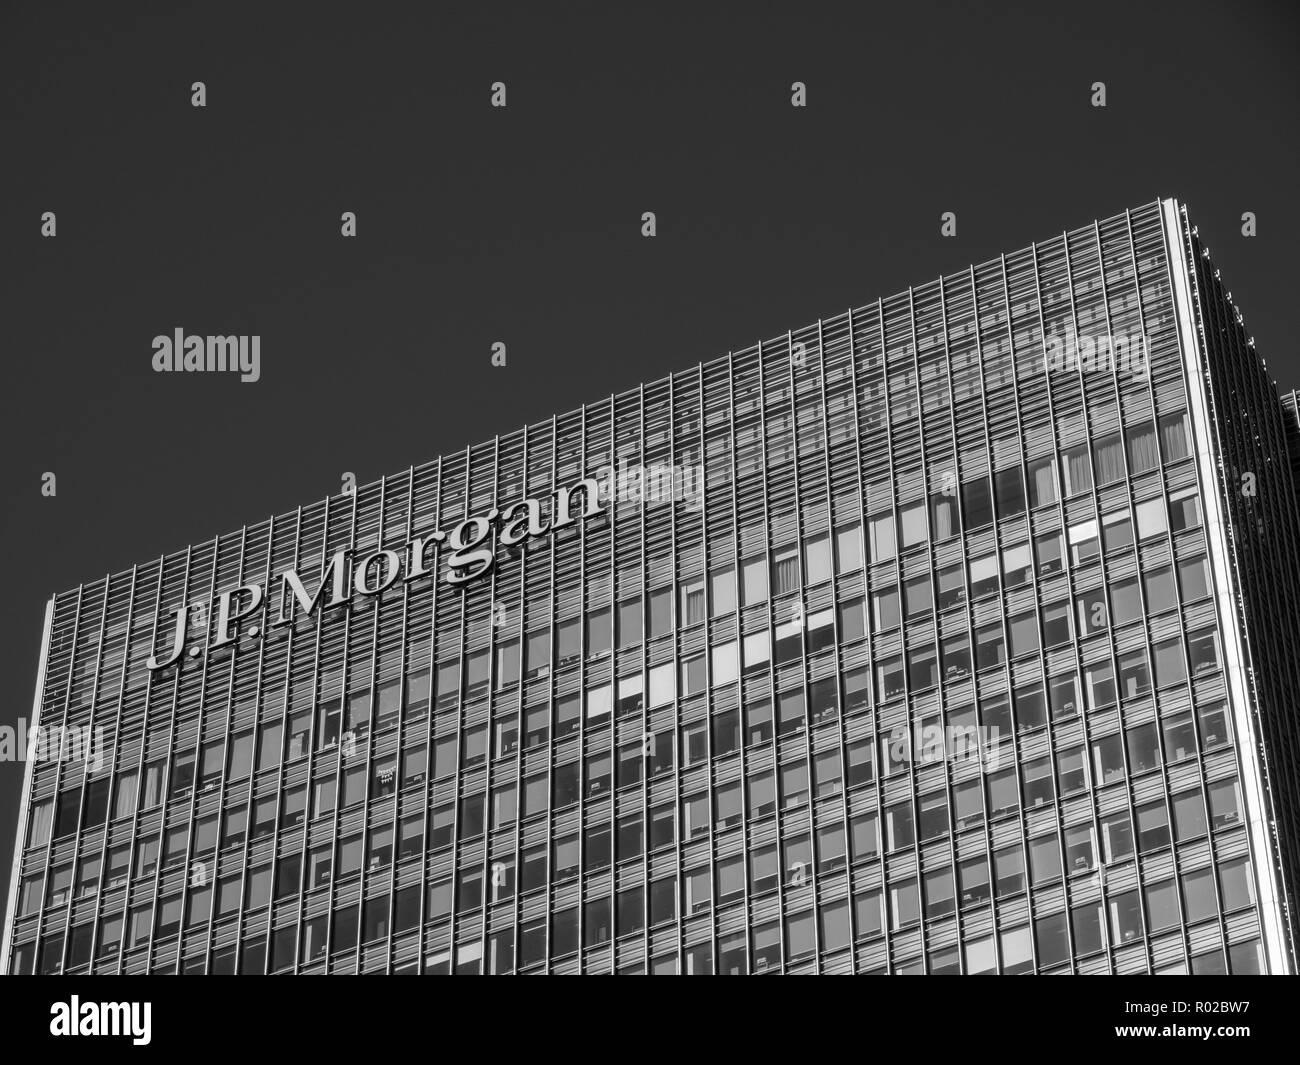 J.P.Morgan Building, Canary Wharf, Docklands, London, England, UK, GB. - Stock Image